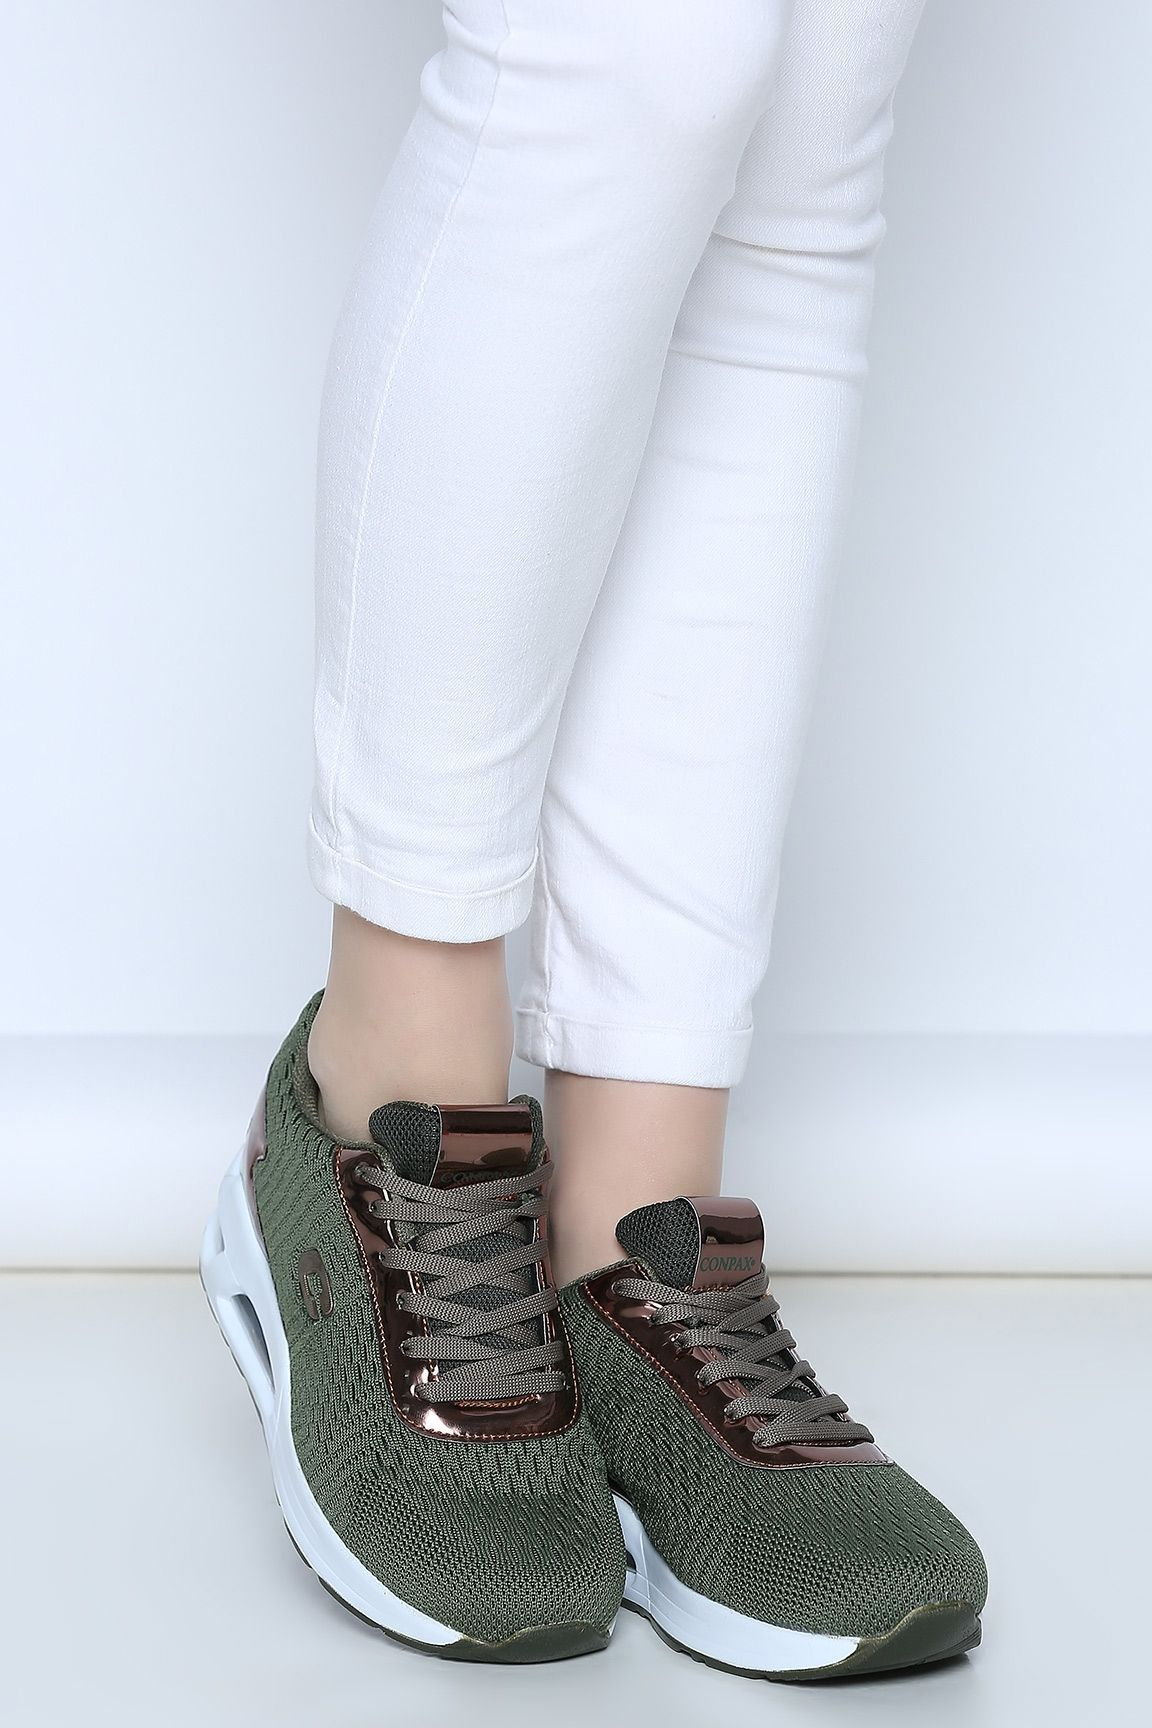 Haki Bagcikli Bayan Spor Ayakkabi Ayakkabi Bagcikli Bayan Haki Spor Flat Lace Up Shoes Sport Shoes Women Sport Shoes